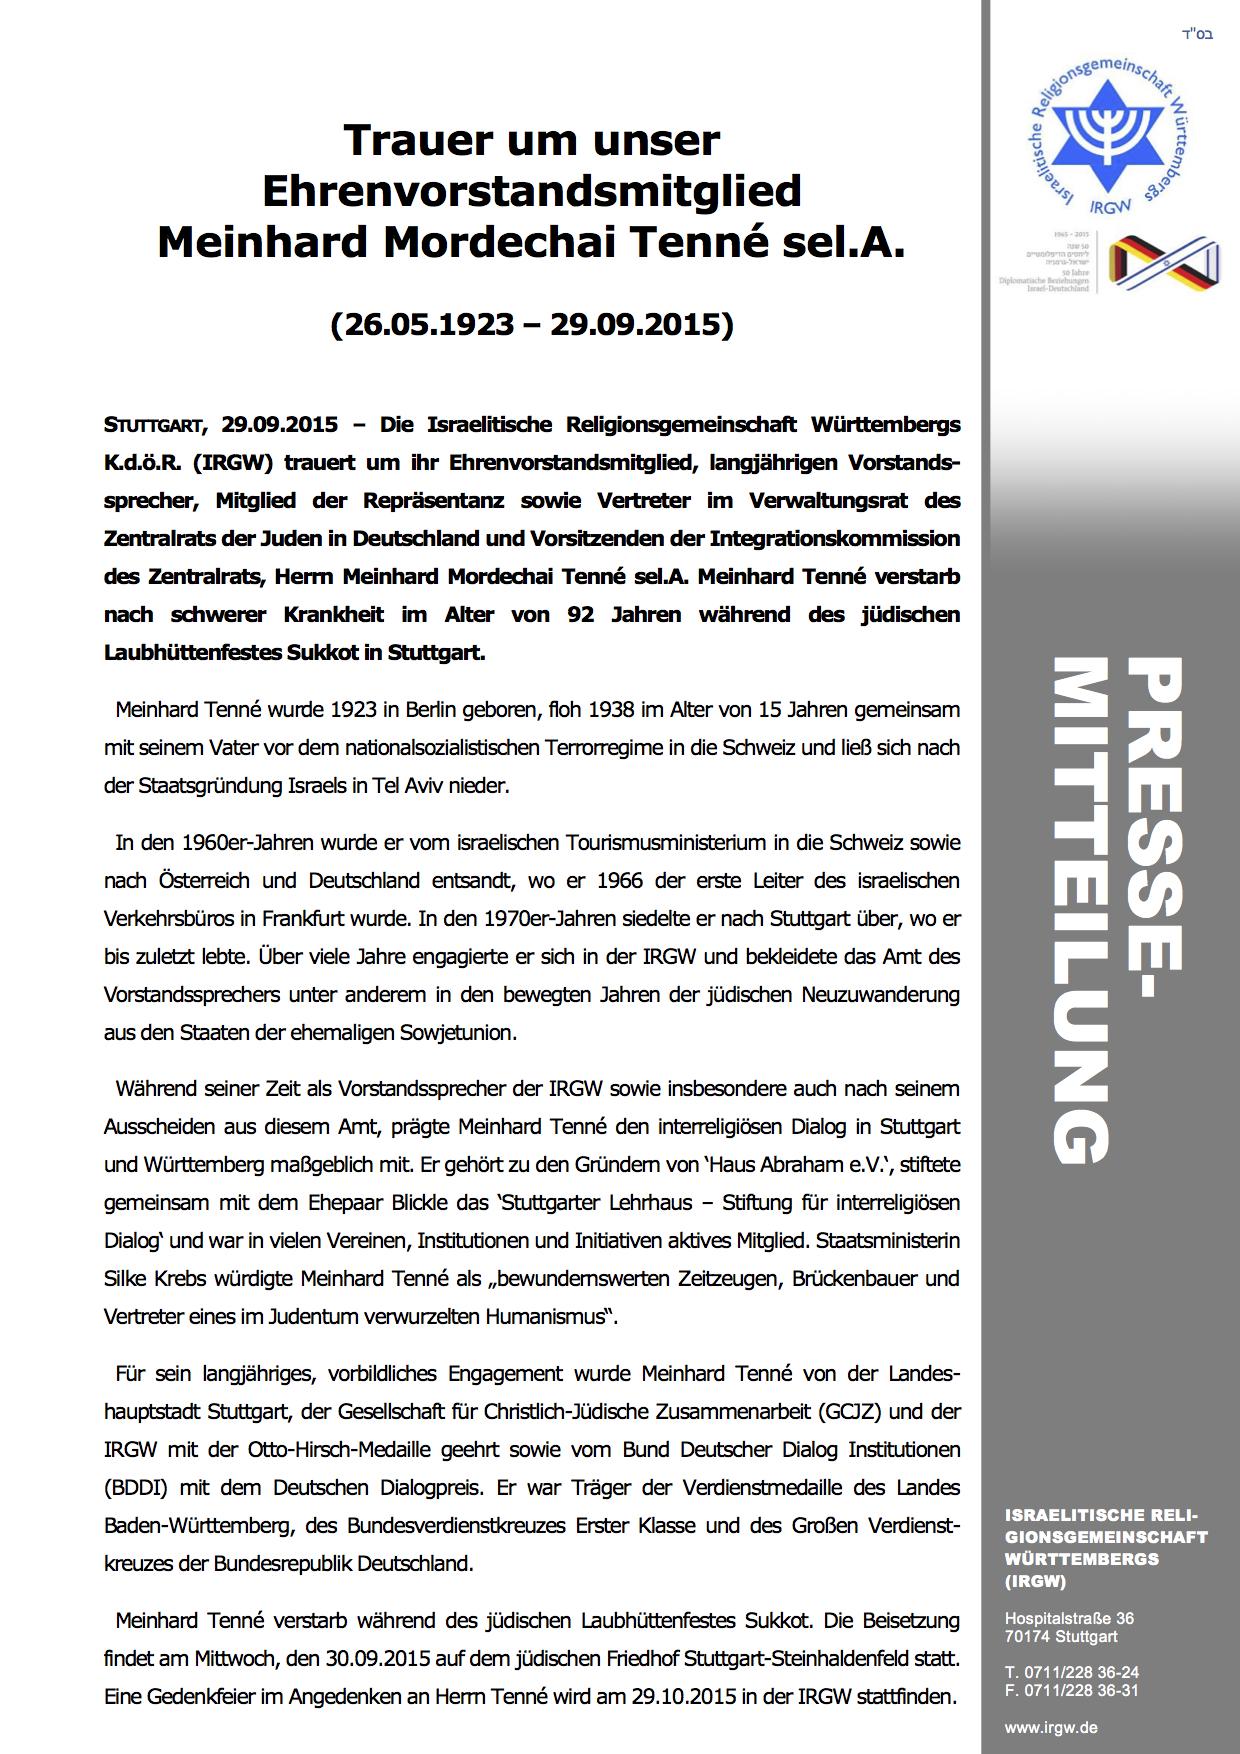 150929-PM_Meinhard_M_Tenne_selA